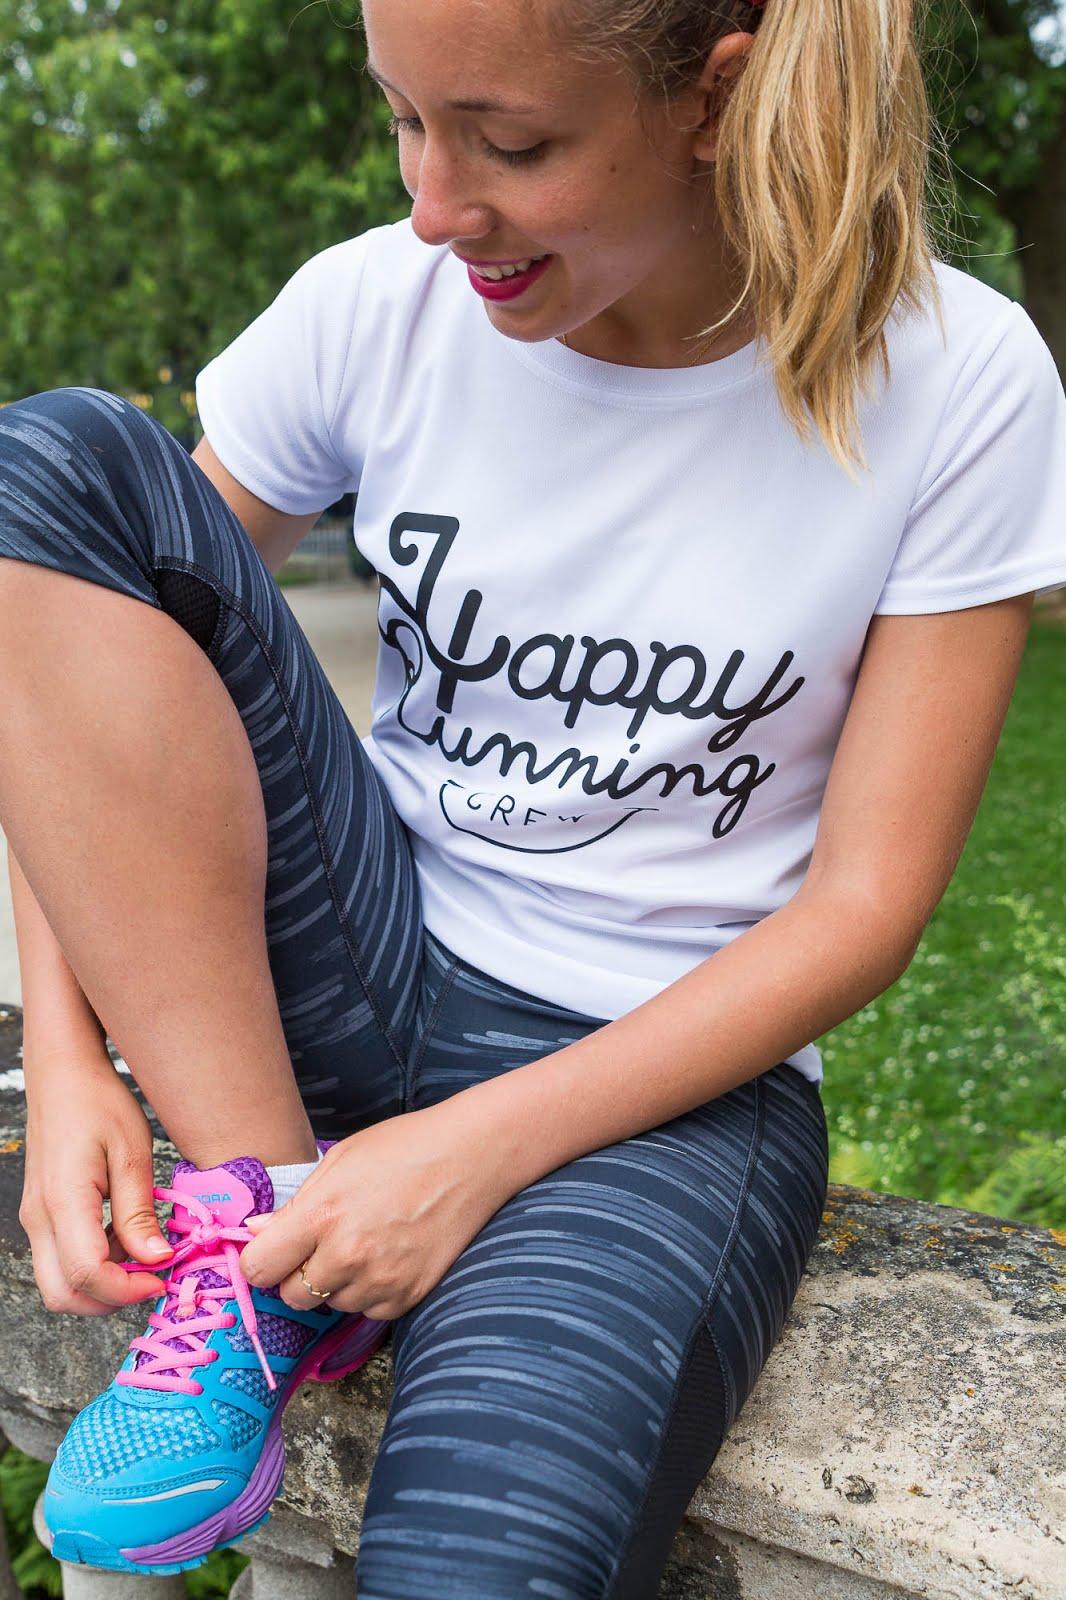 blog sport running course à pied